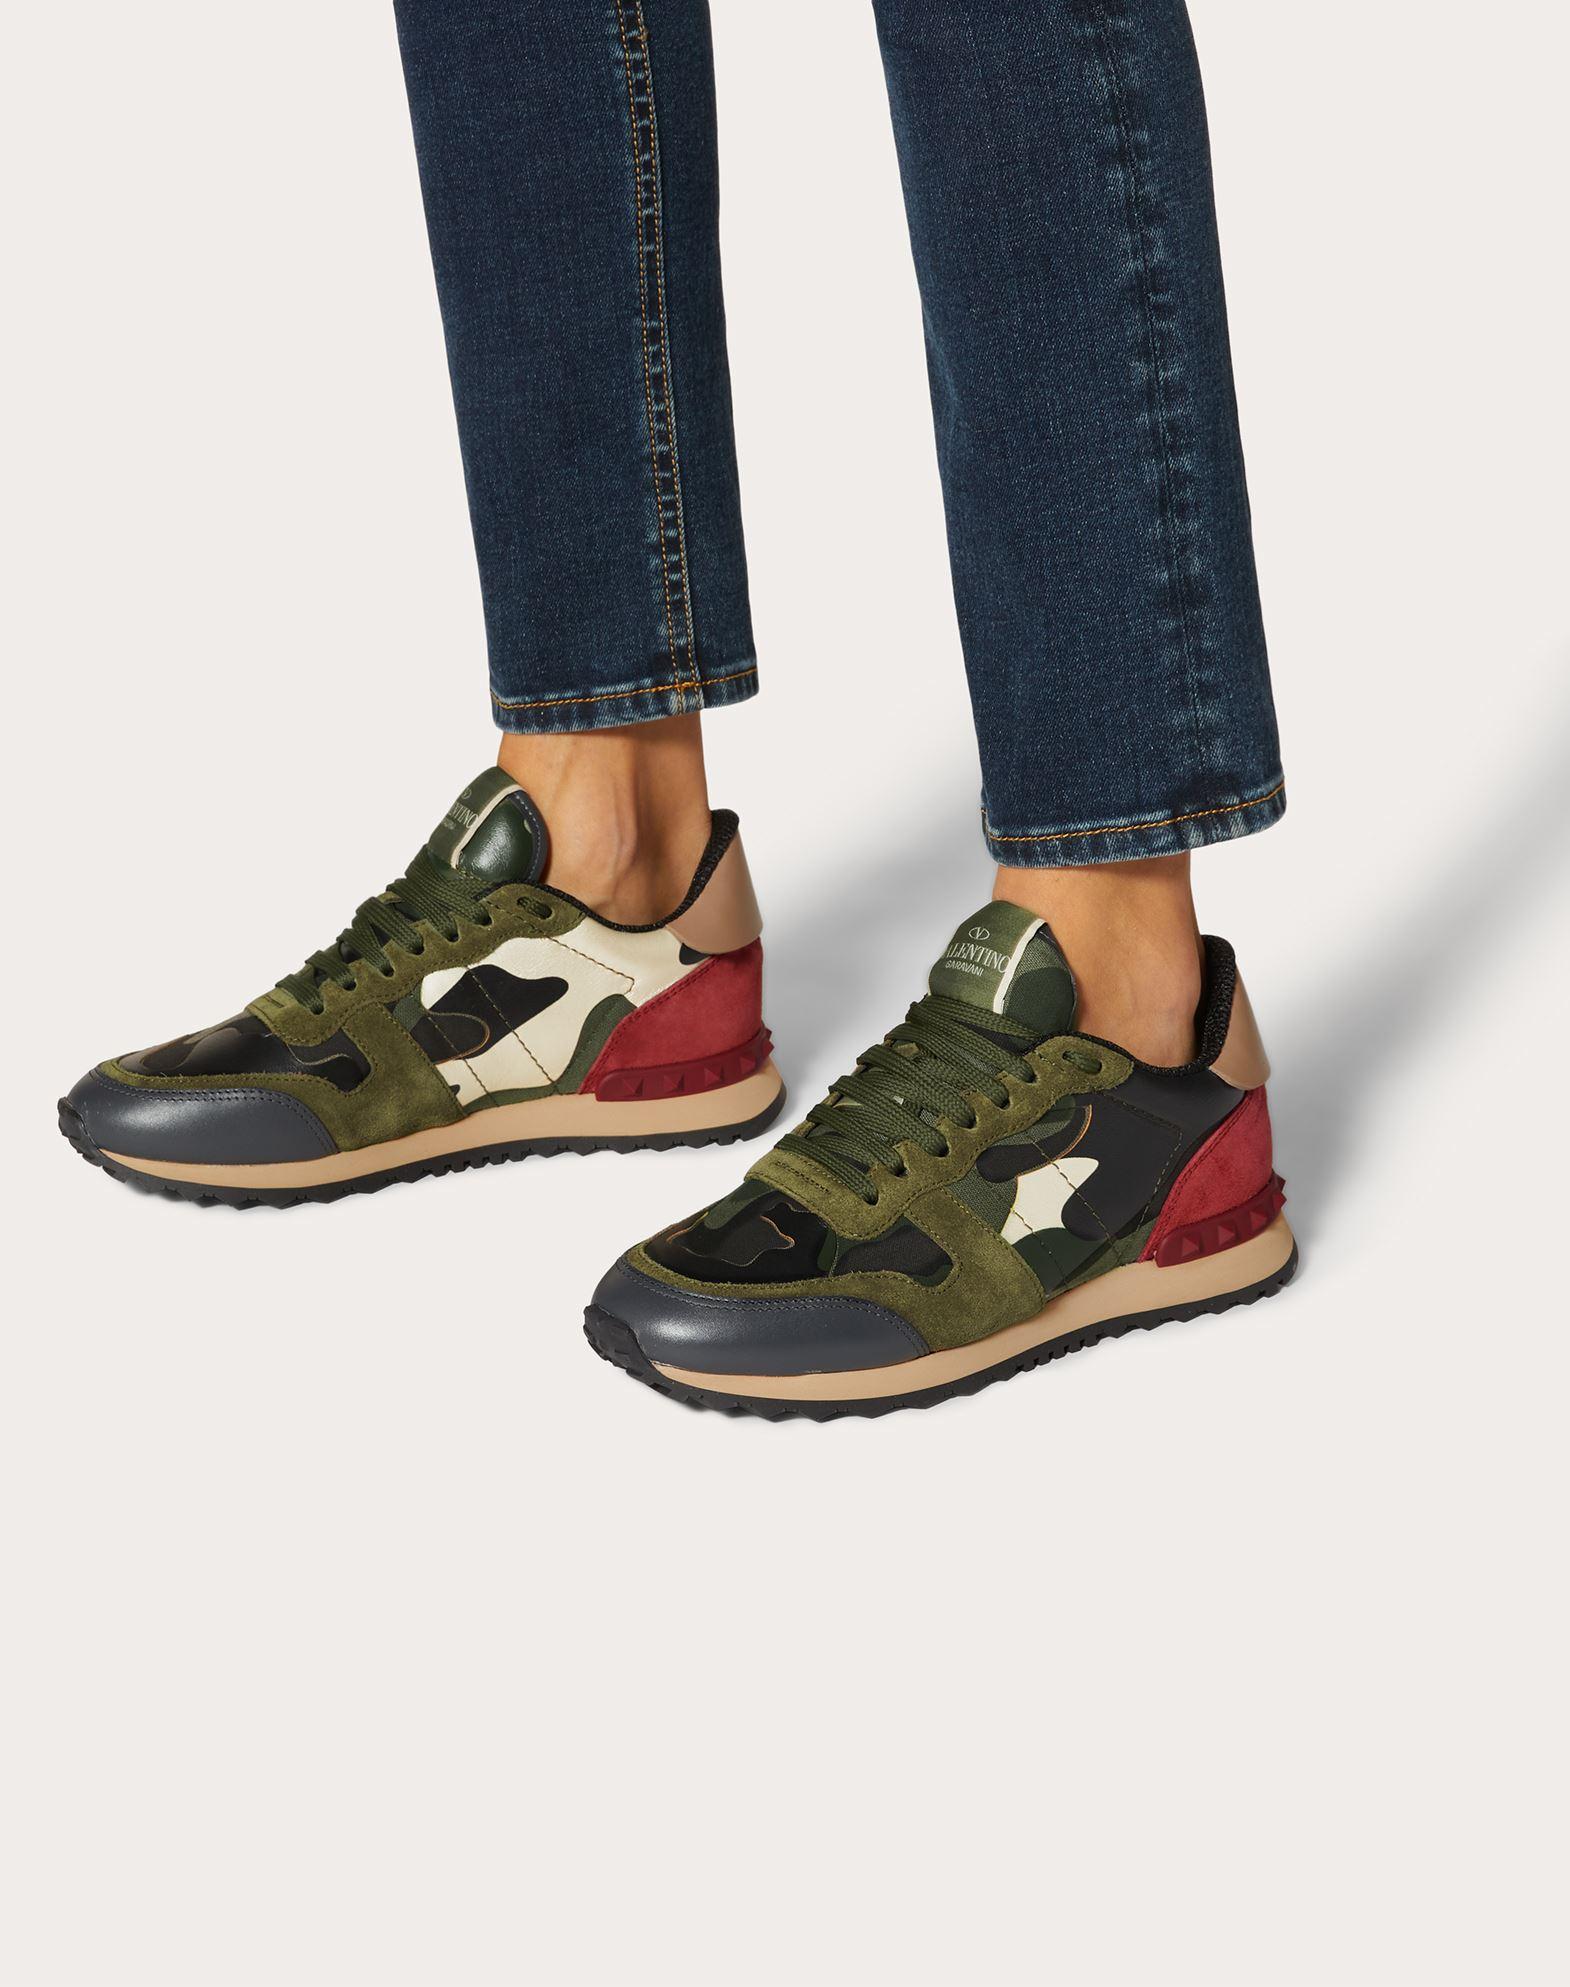 VALENTINO GARAVANI Camouflage sneaker LOW-TOP SNEAKERS D b